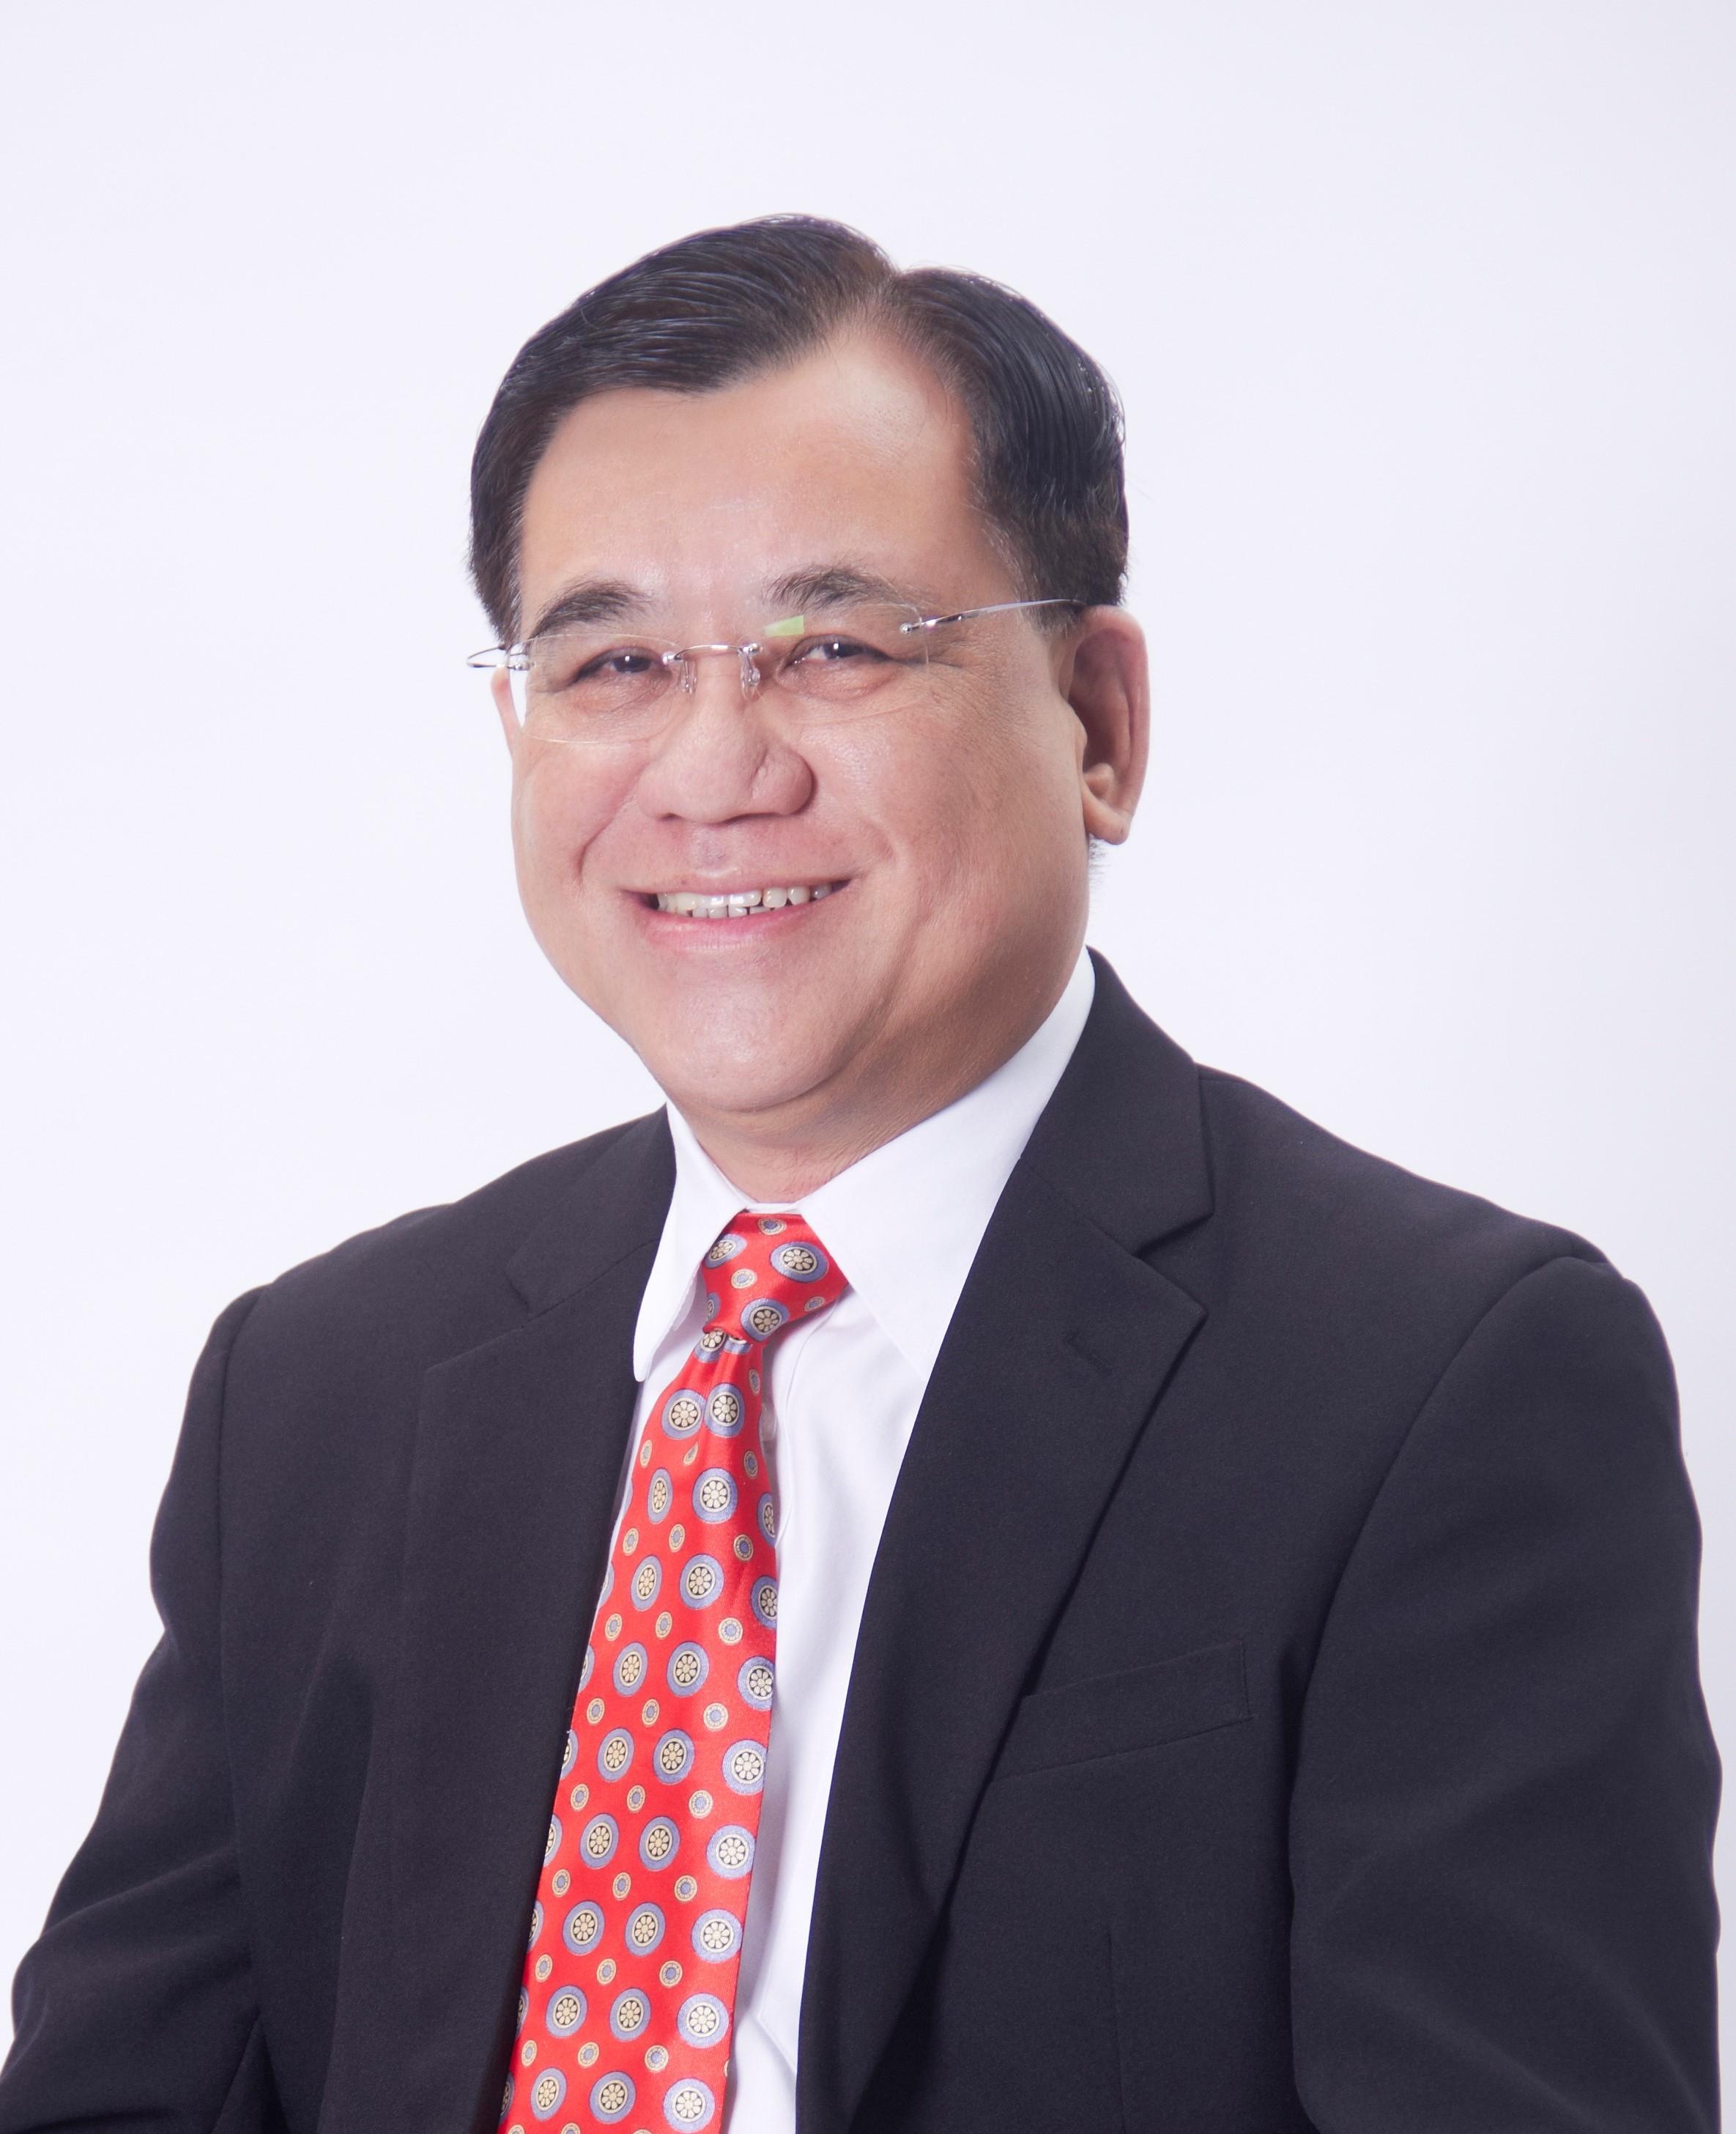 Speaker_MR_Chong_Mok_Yong